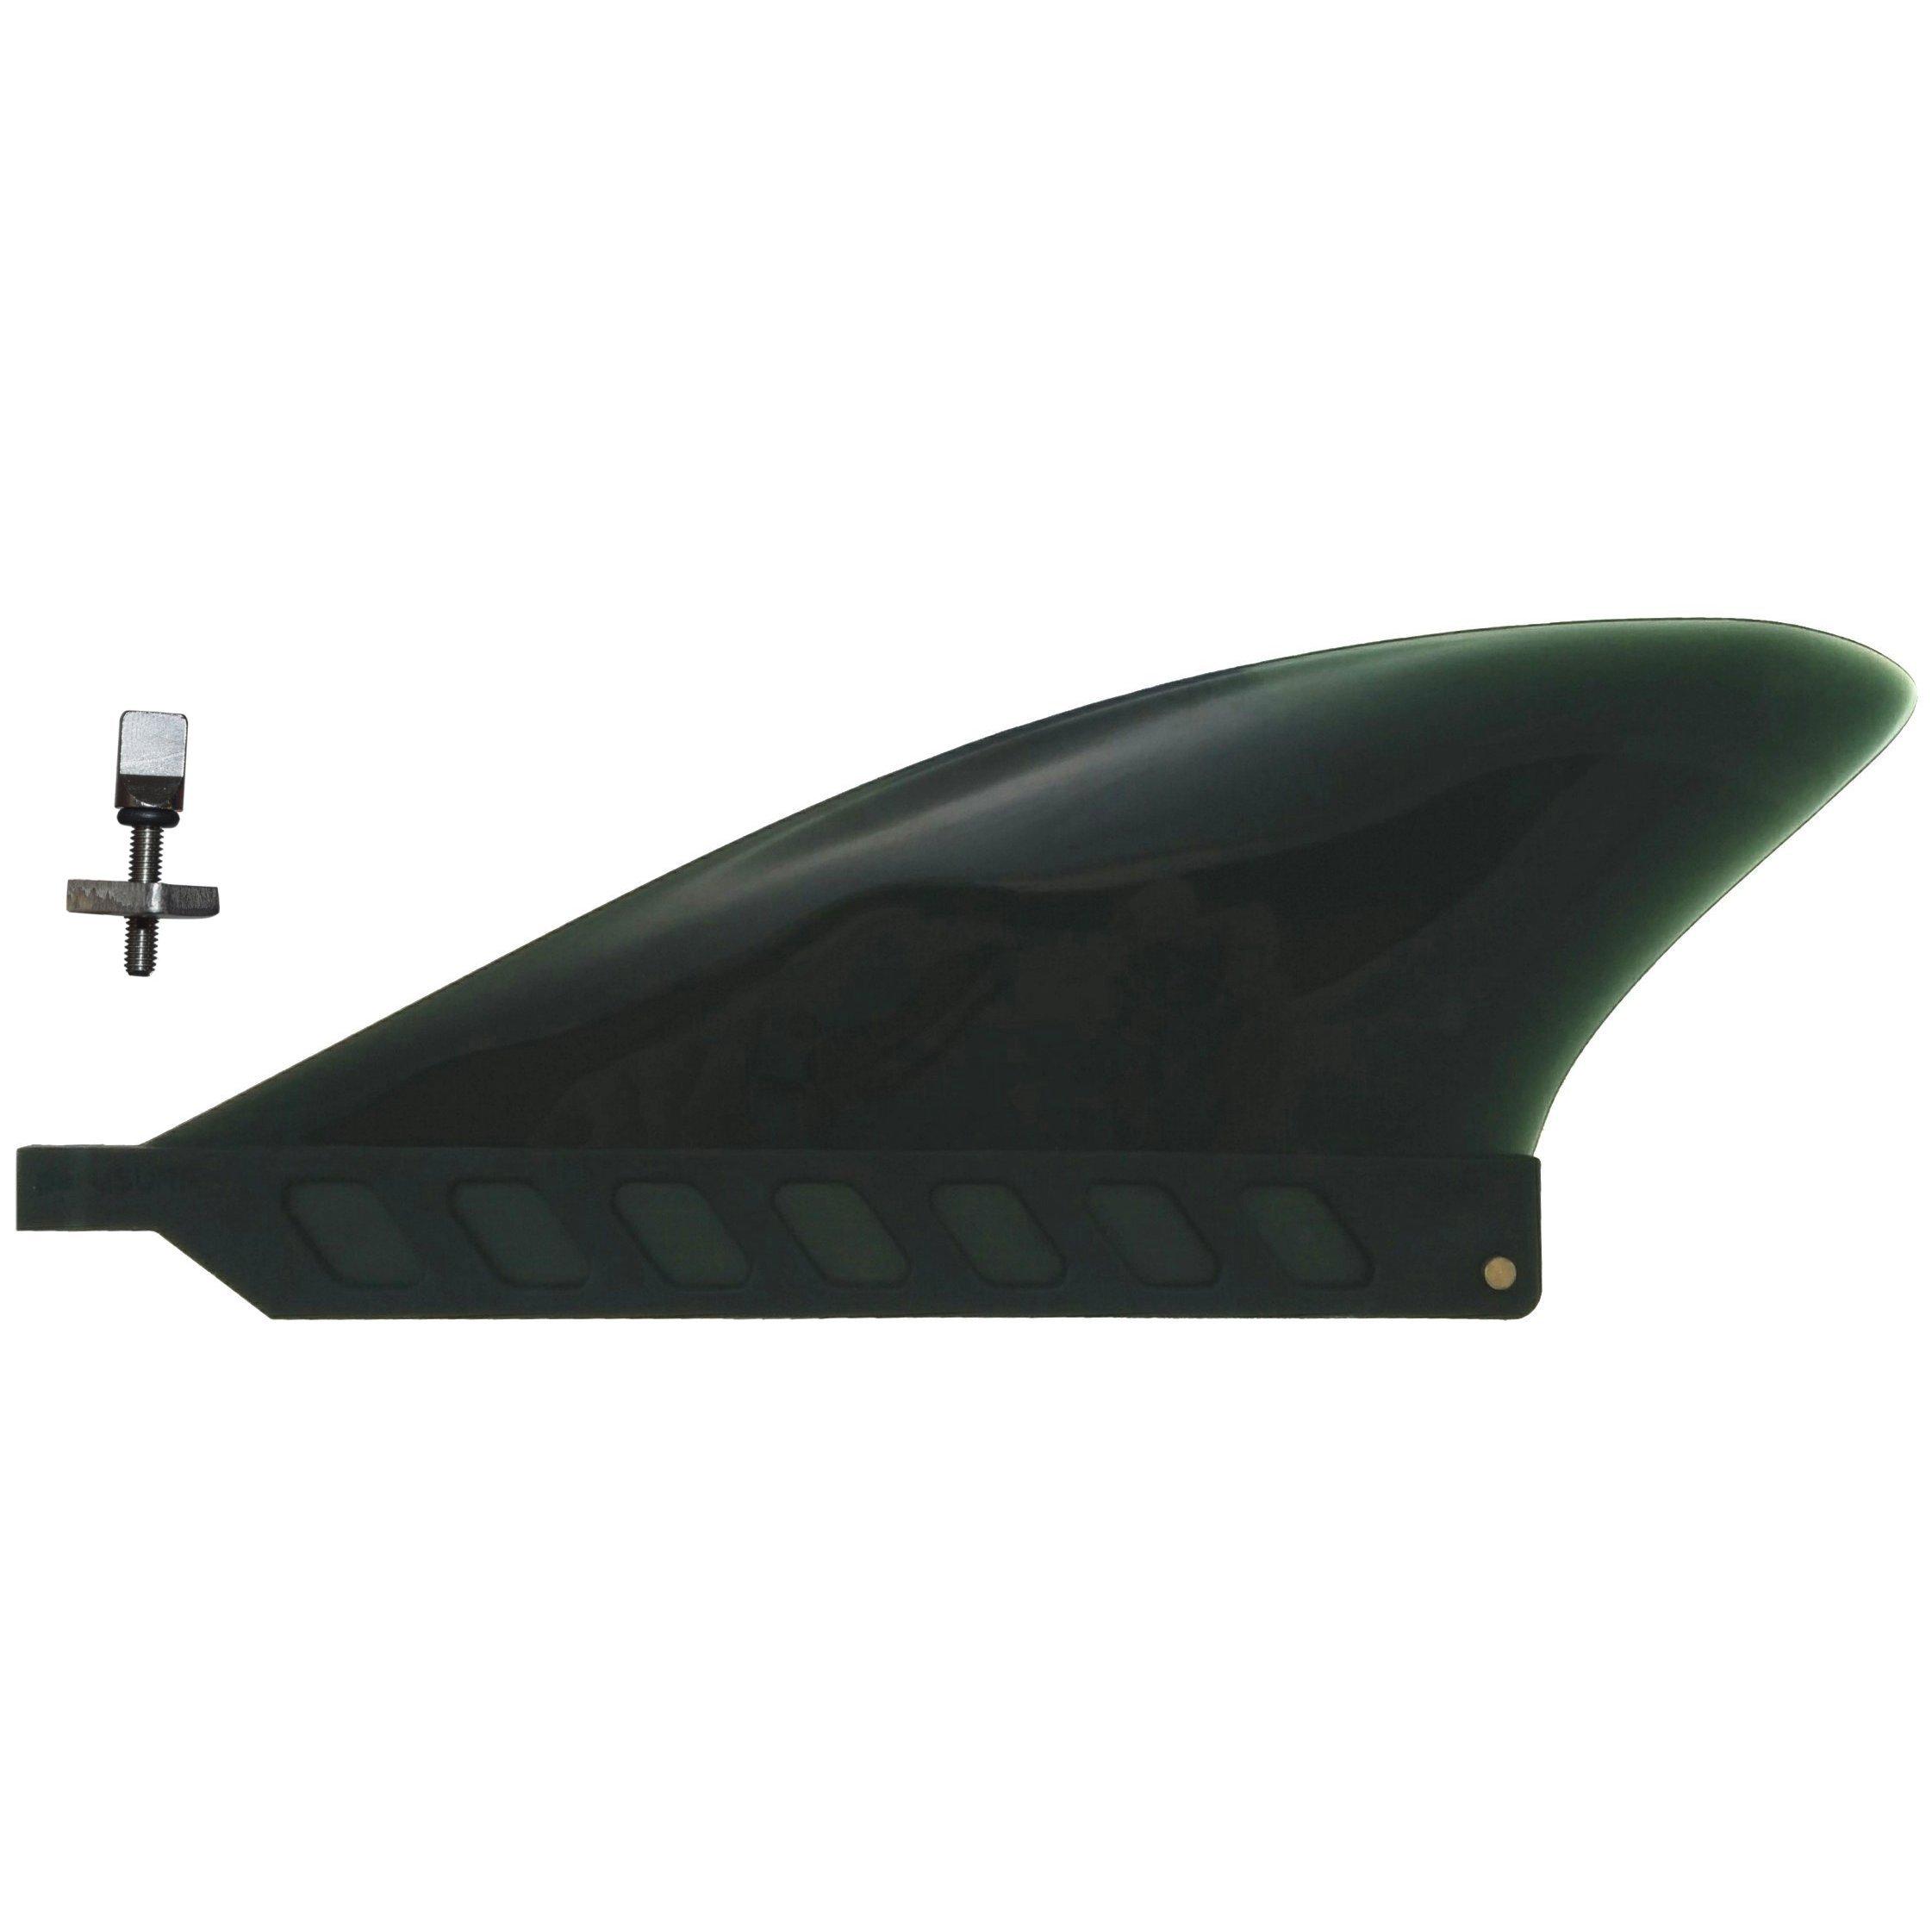 saruSURF Center Safety Longboard airSUP